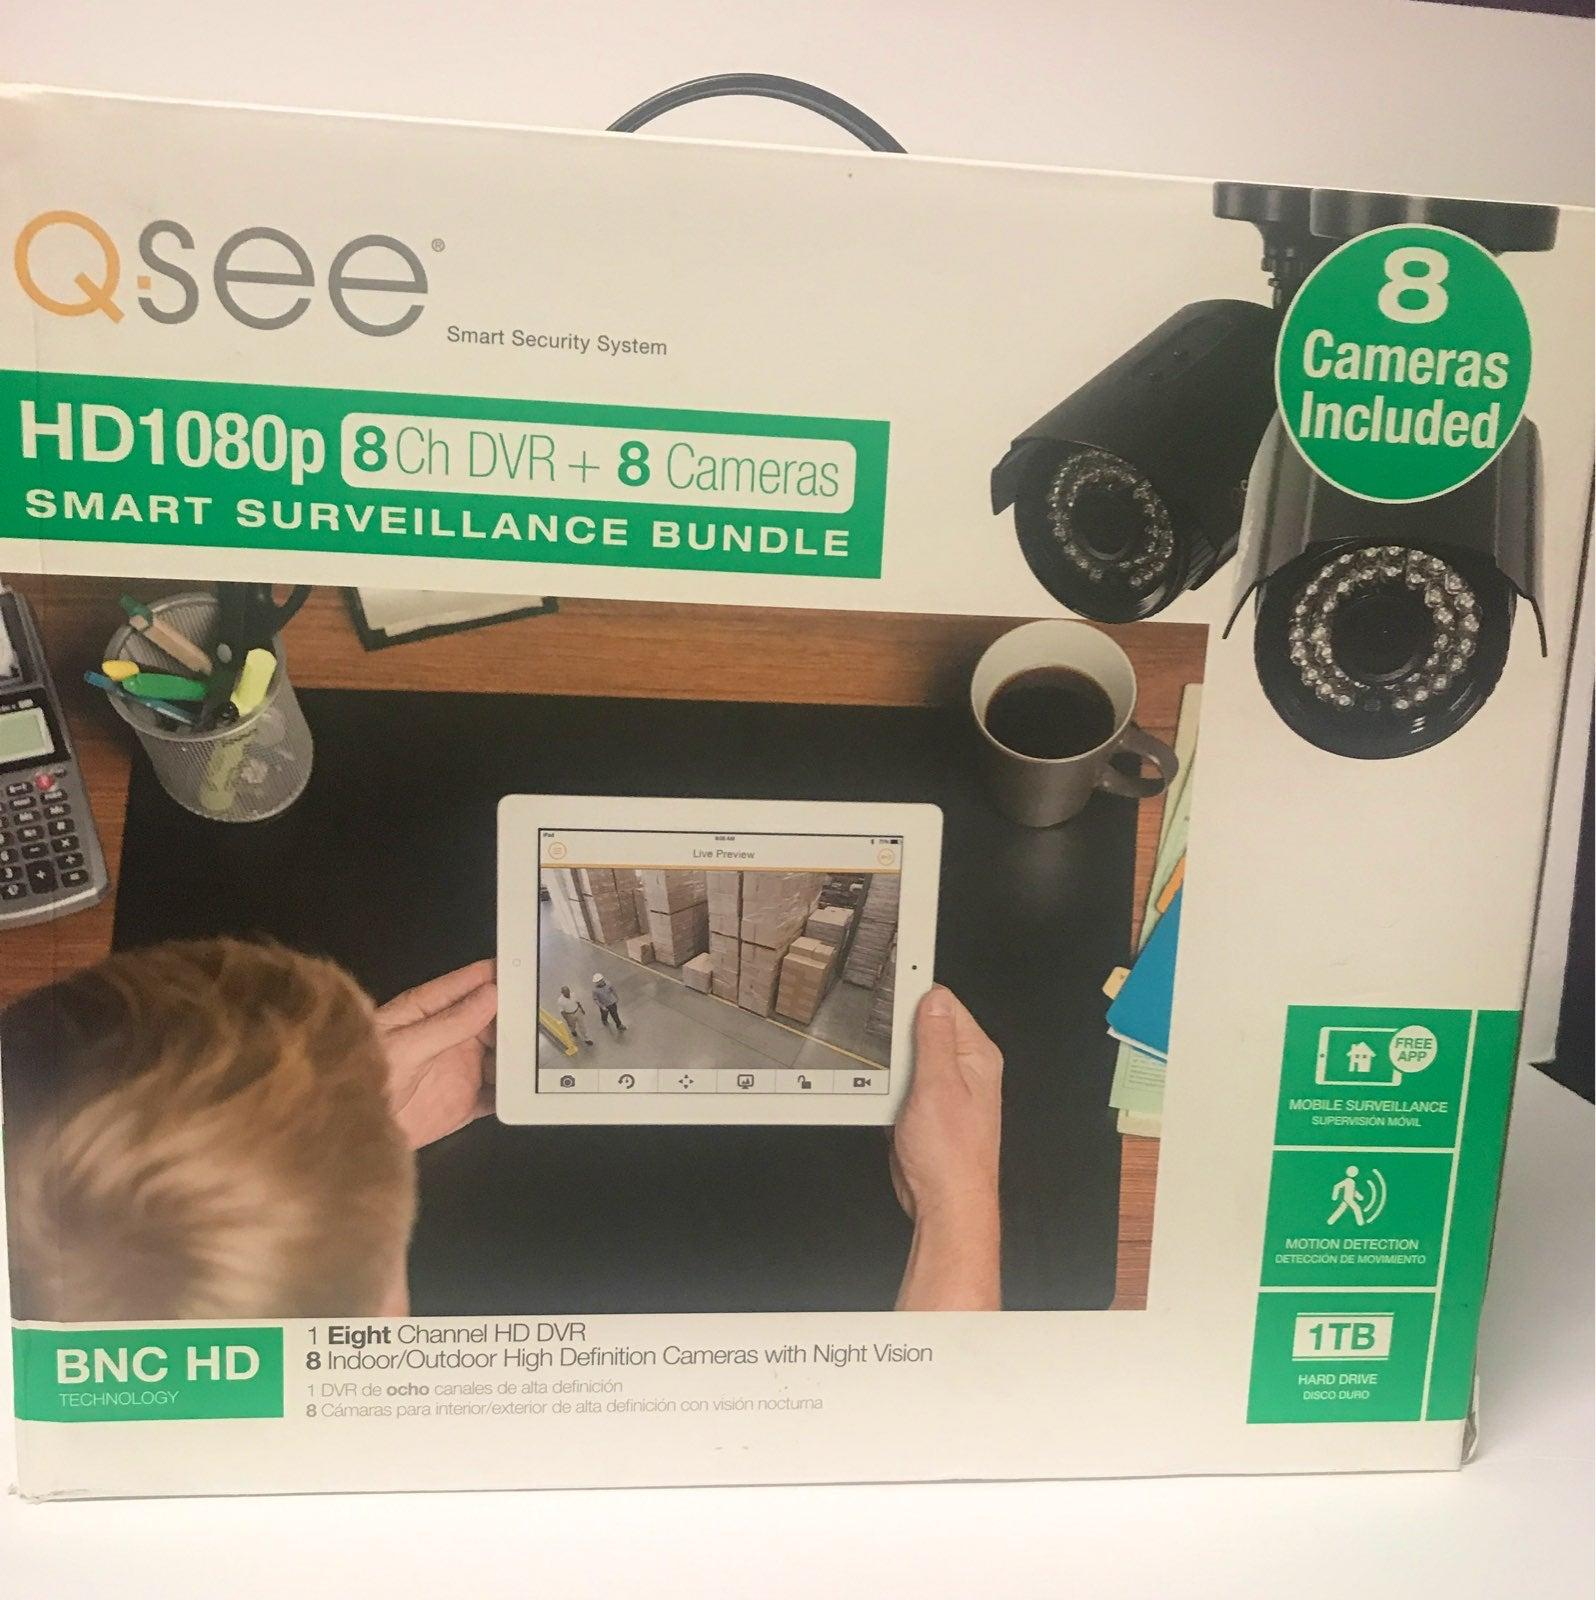 Q-See HD 1080p-8Ch Dvr + 8 Camera Smart